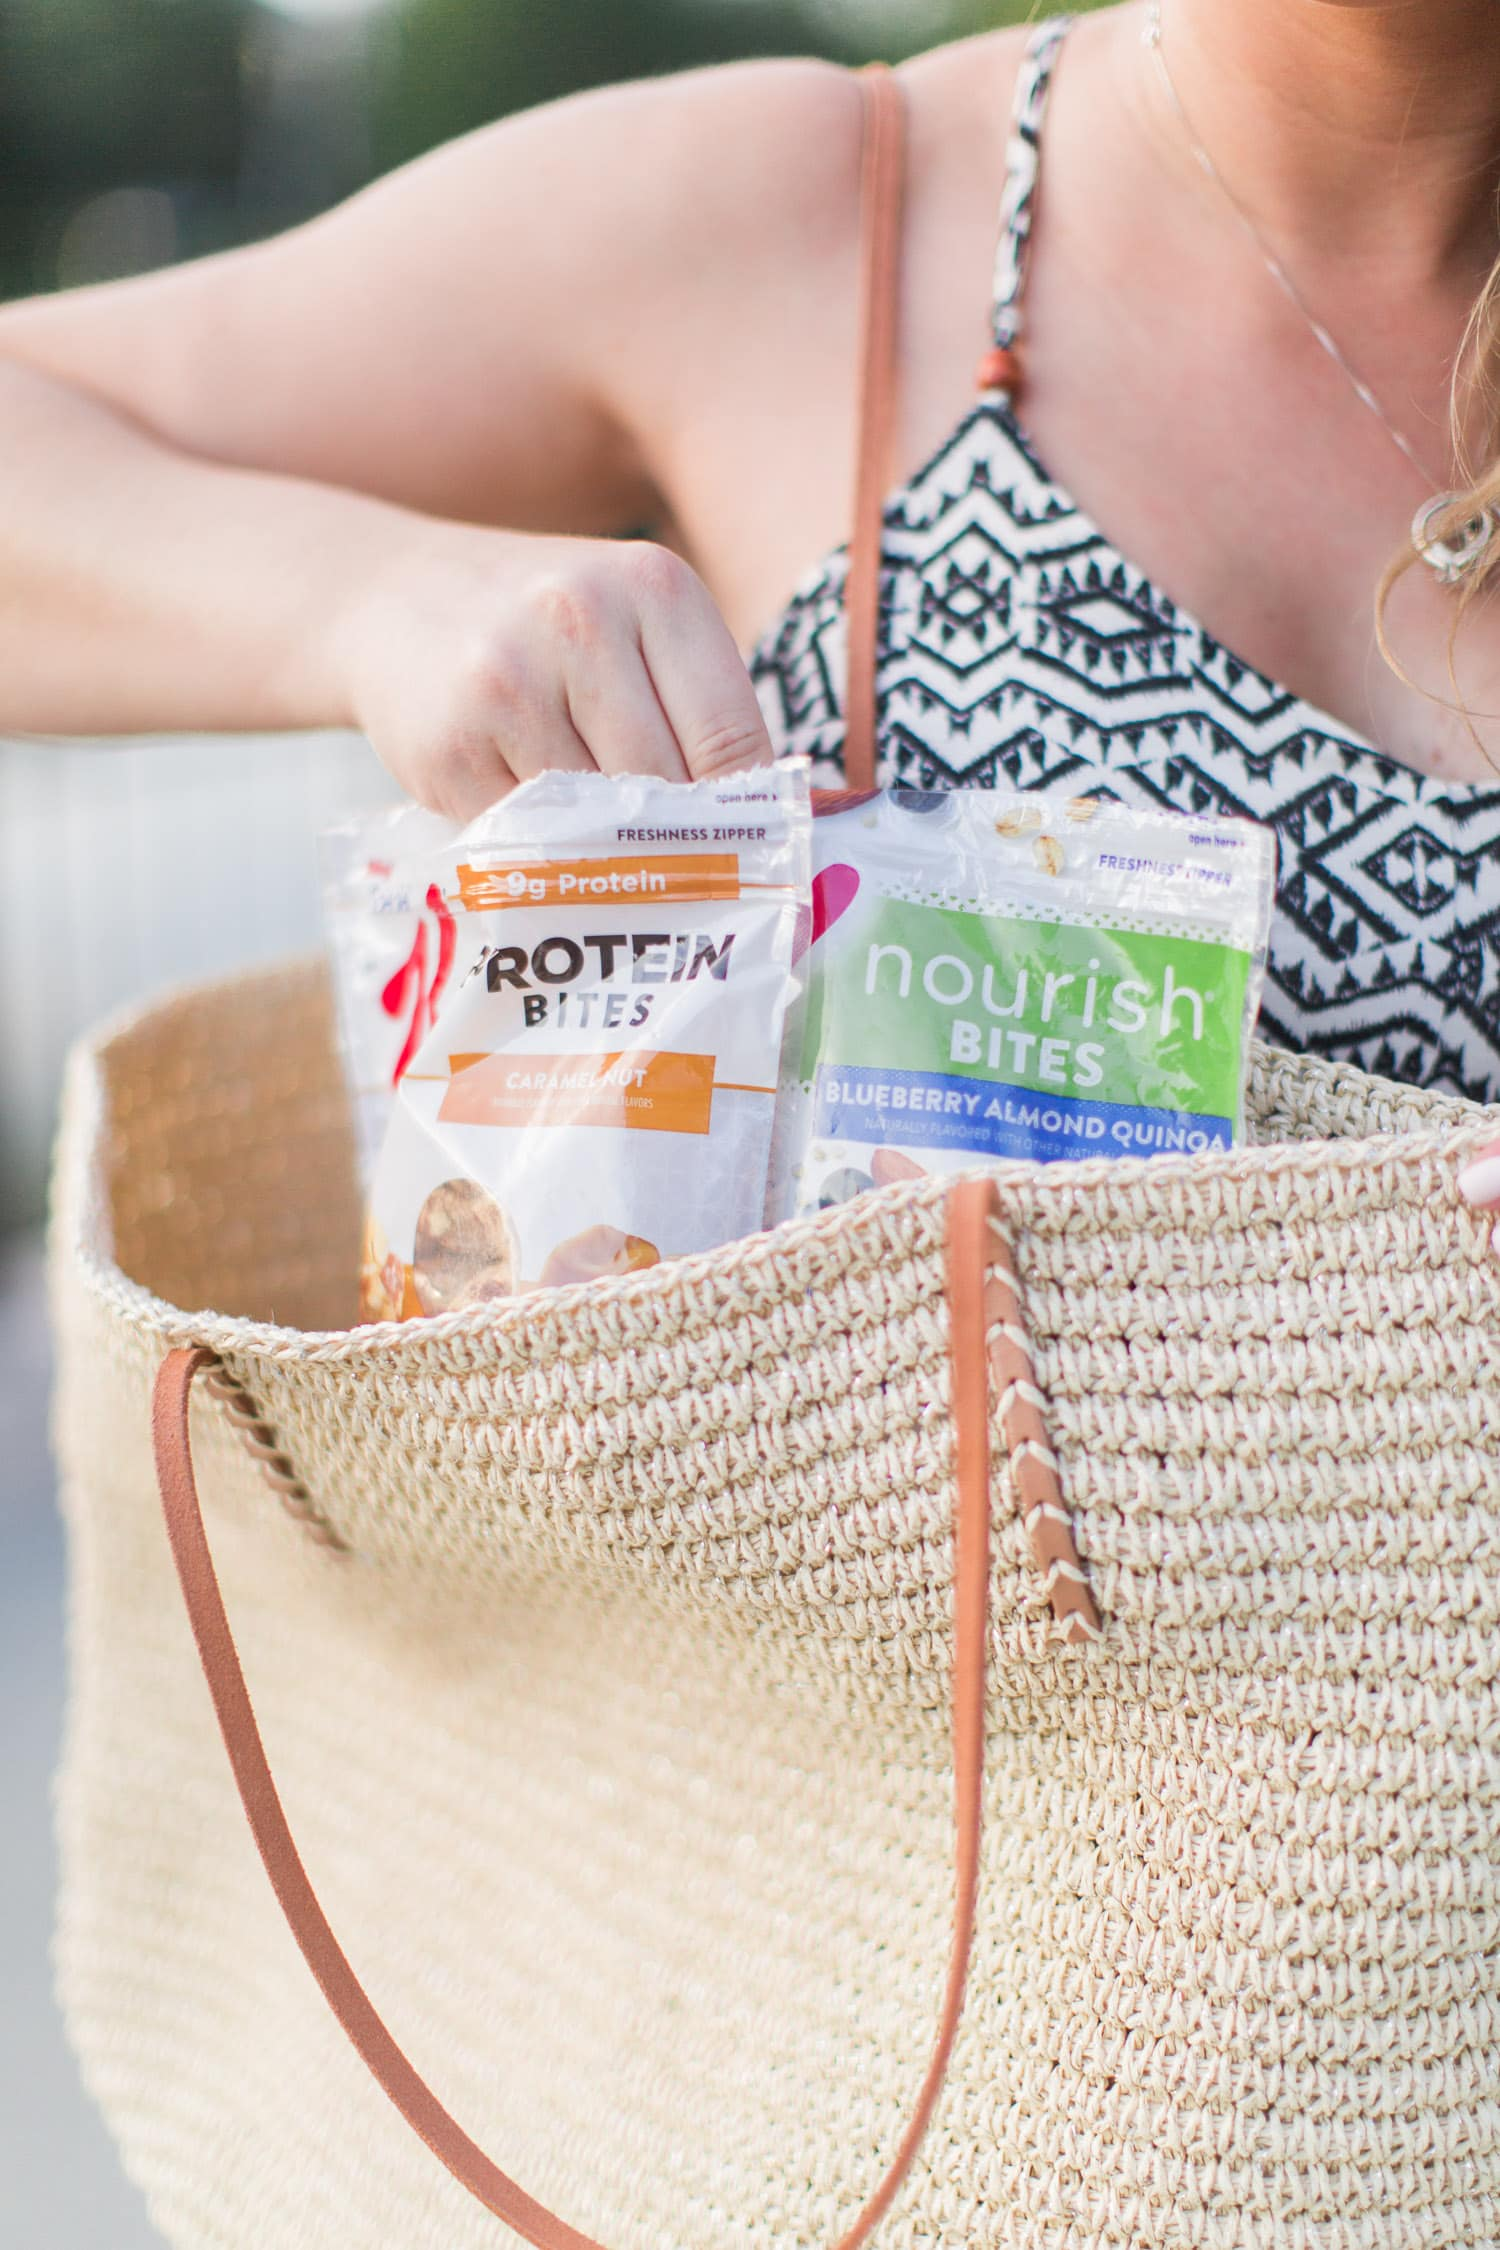 protein and nourish bites special k   summer pregnancy survival kit cute dress   beauty blogger Ashley Brooke Nicholas